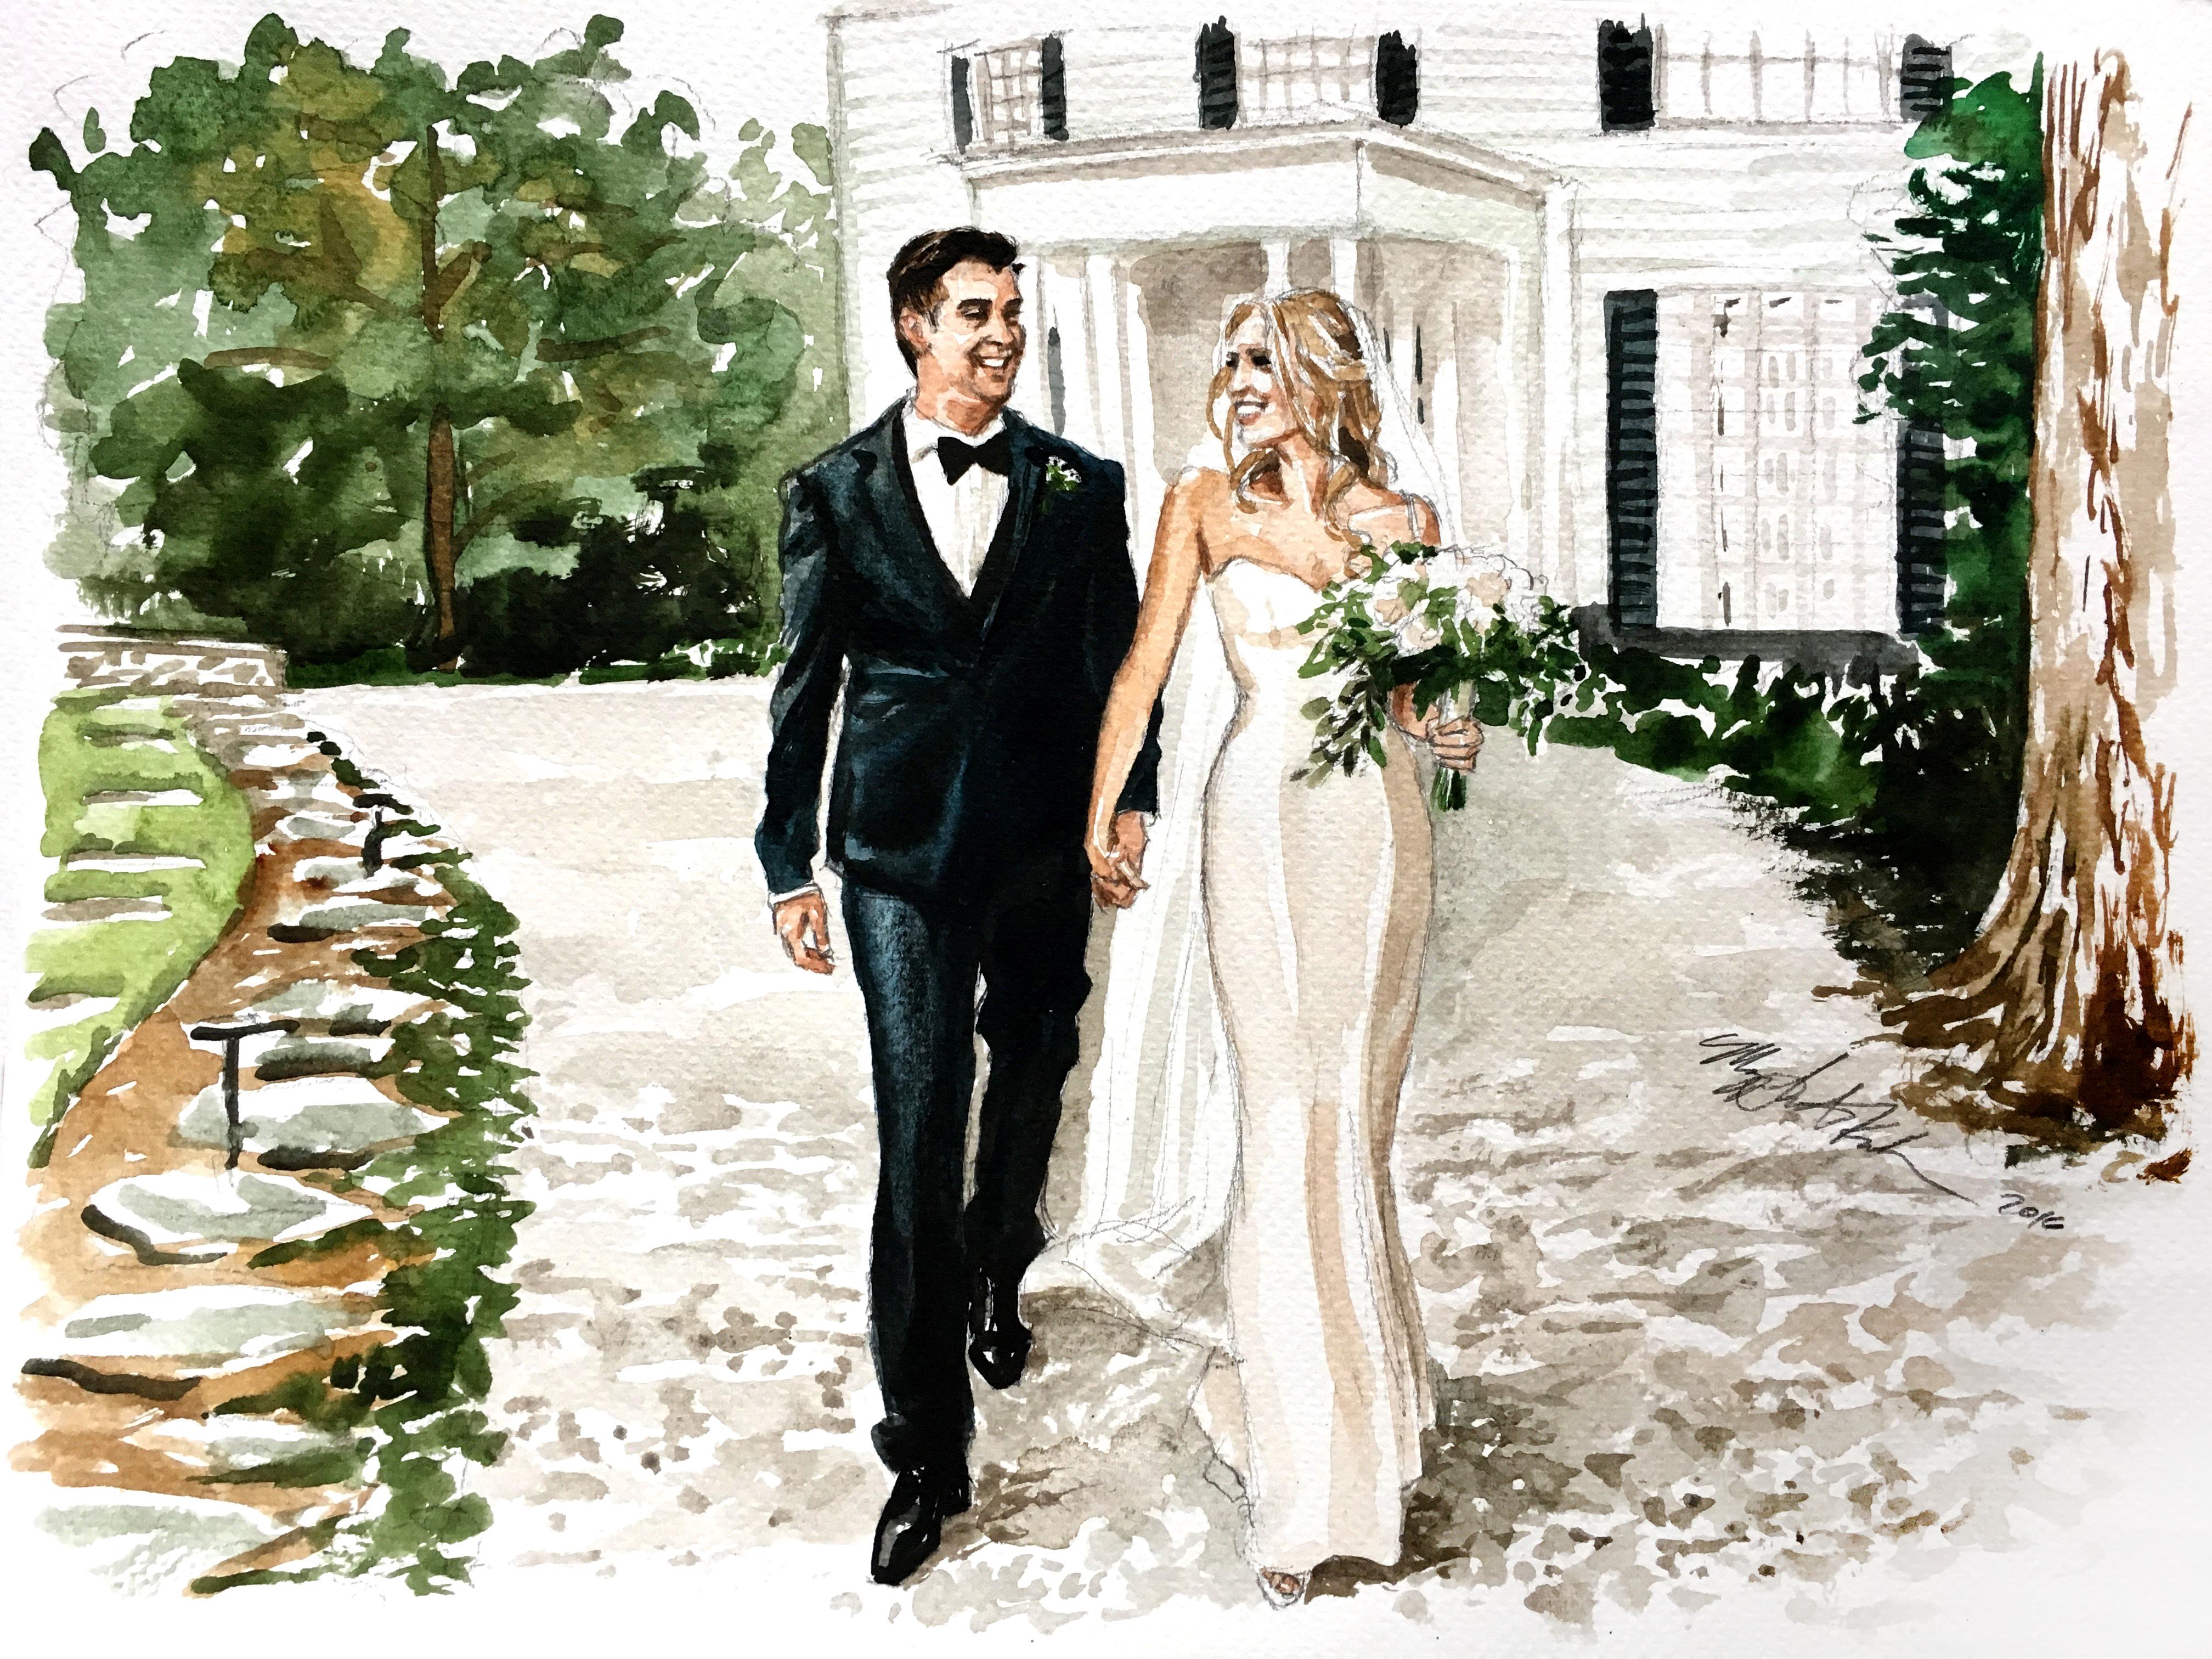 4032x3024 Wedding Photography Based Watercolor Portrait Iamnotmaggie